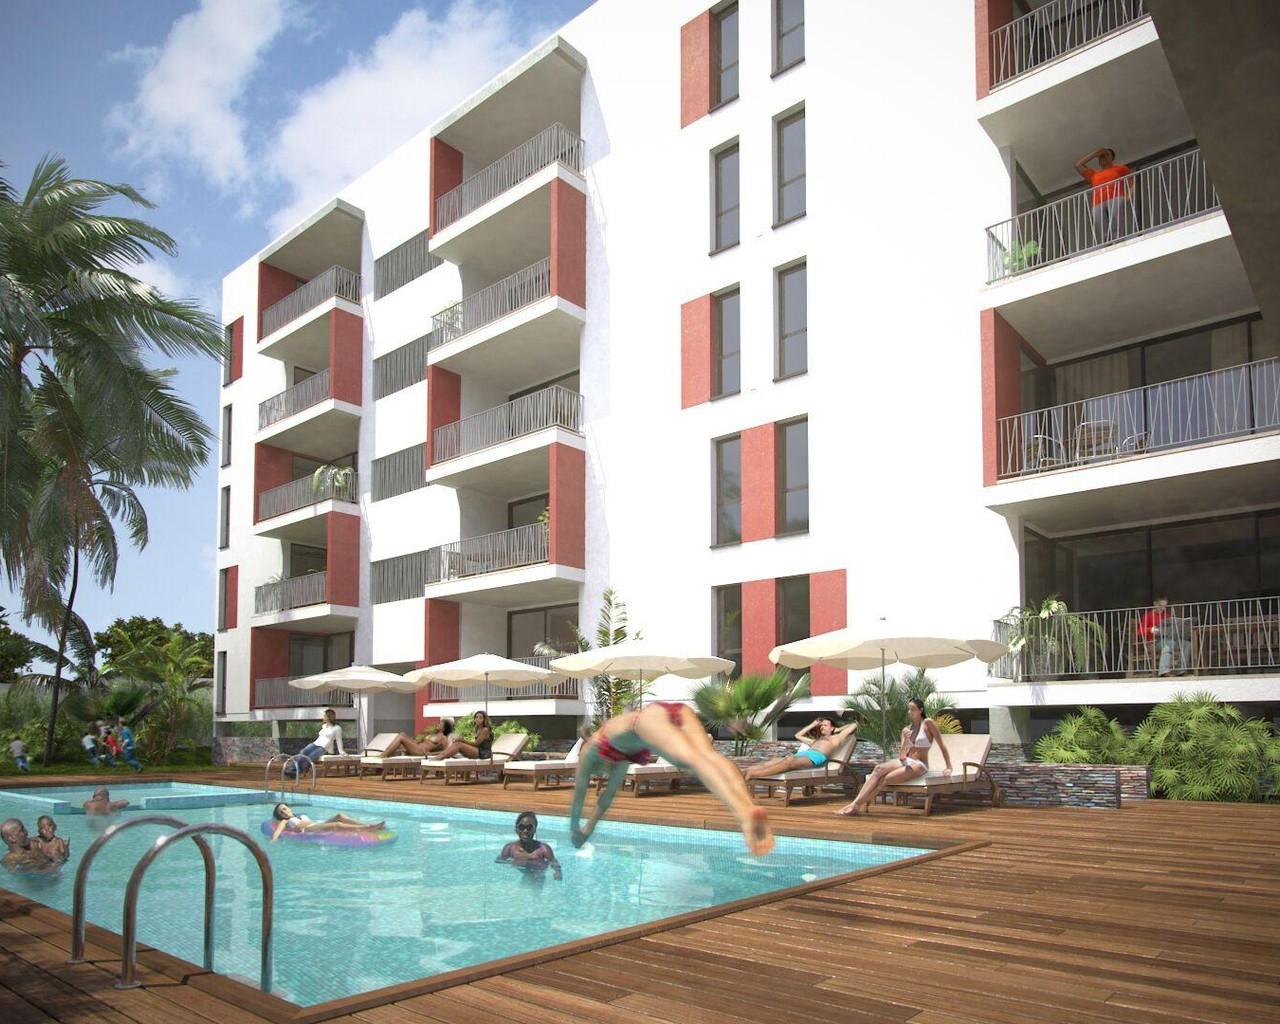 Promo 80 Off Airport West Hotel Accra Ghana 4 Rooms Hotel Gjirokaster